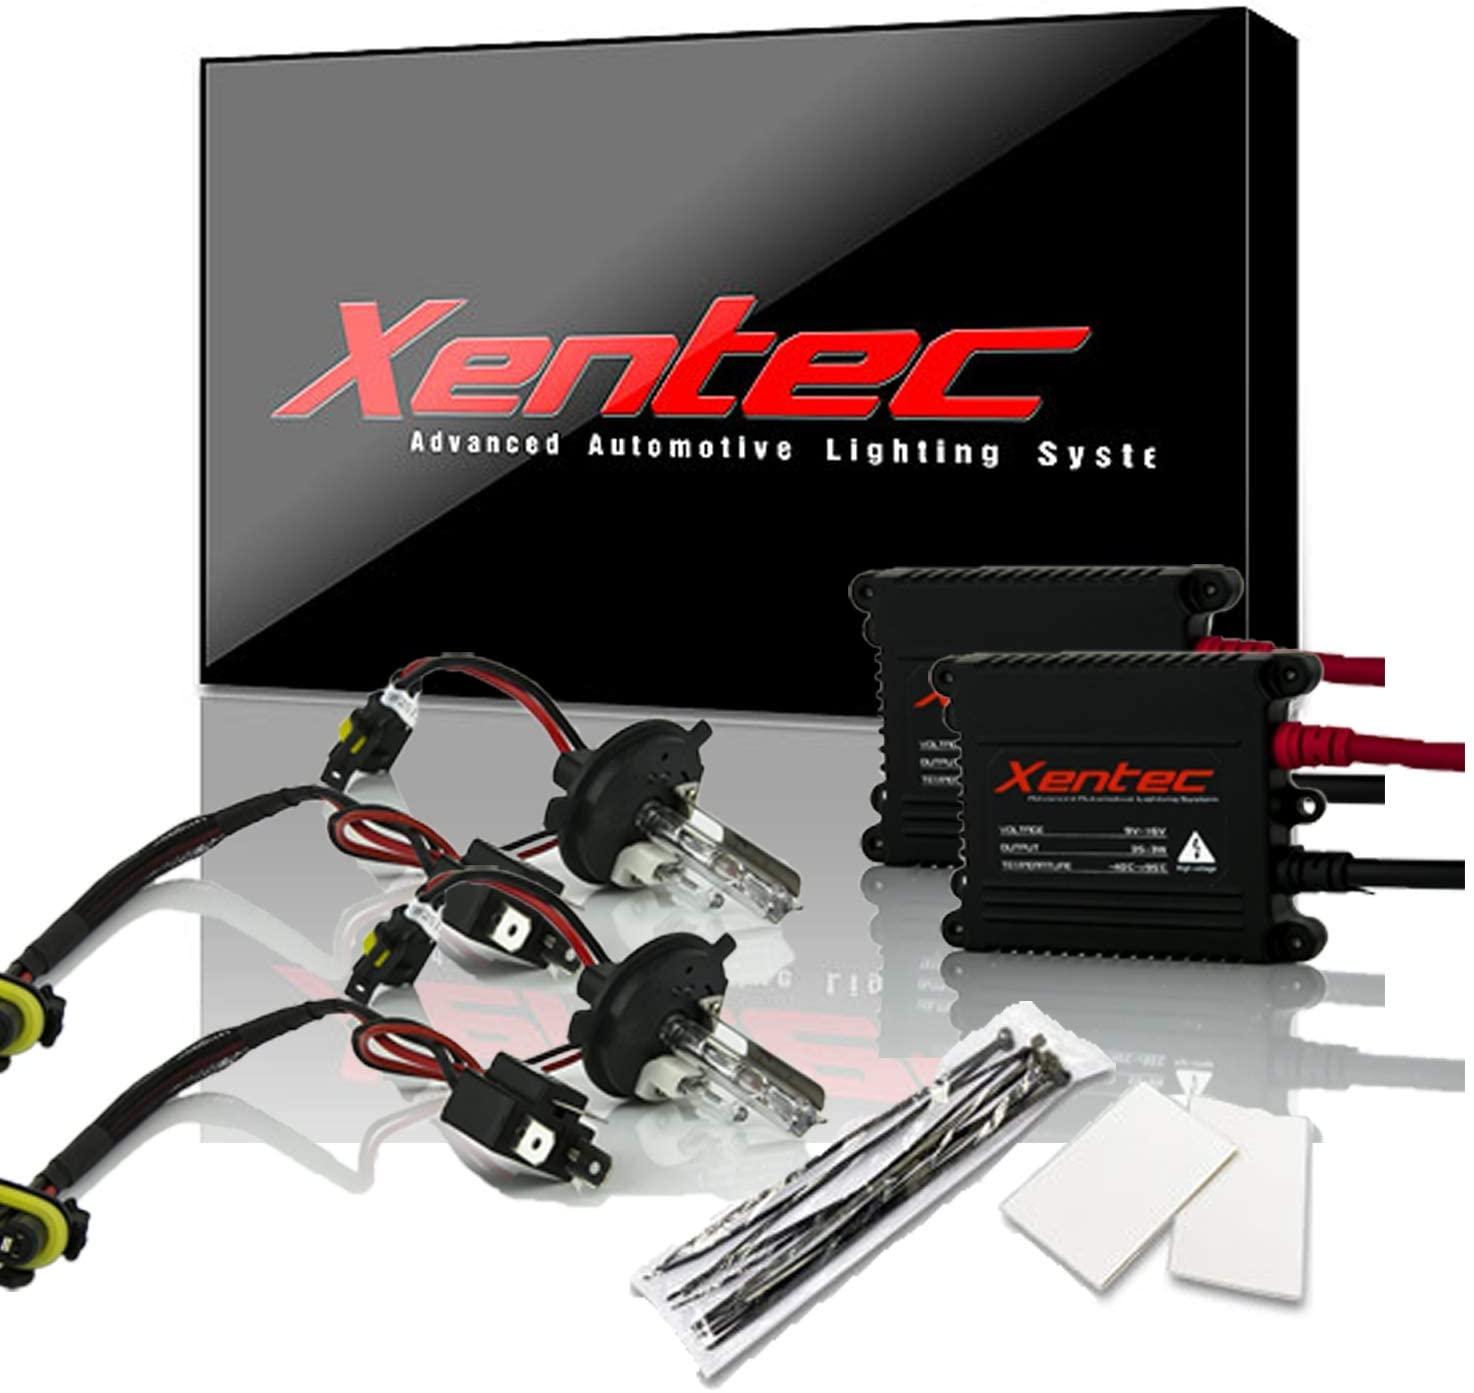 Xentec H4 (HB2) 6000K Hi/Lo HID xenon bulb x 1 pair bundle with 2 x 35W Digital Slim Ballast (Ultra White, high beam halogen)